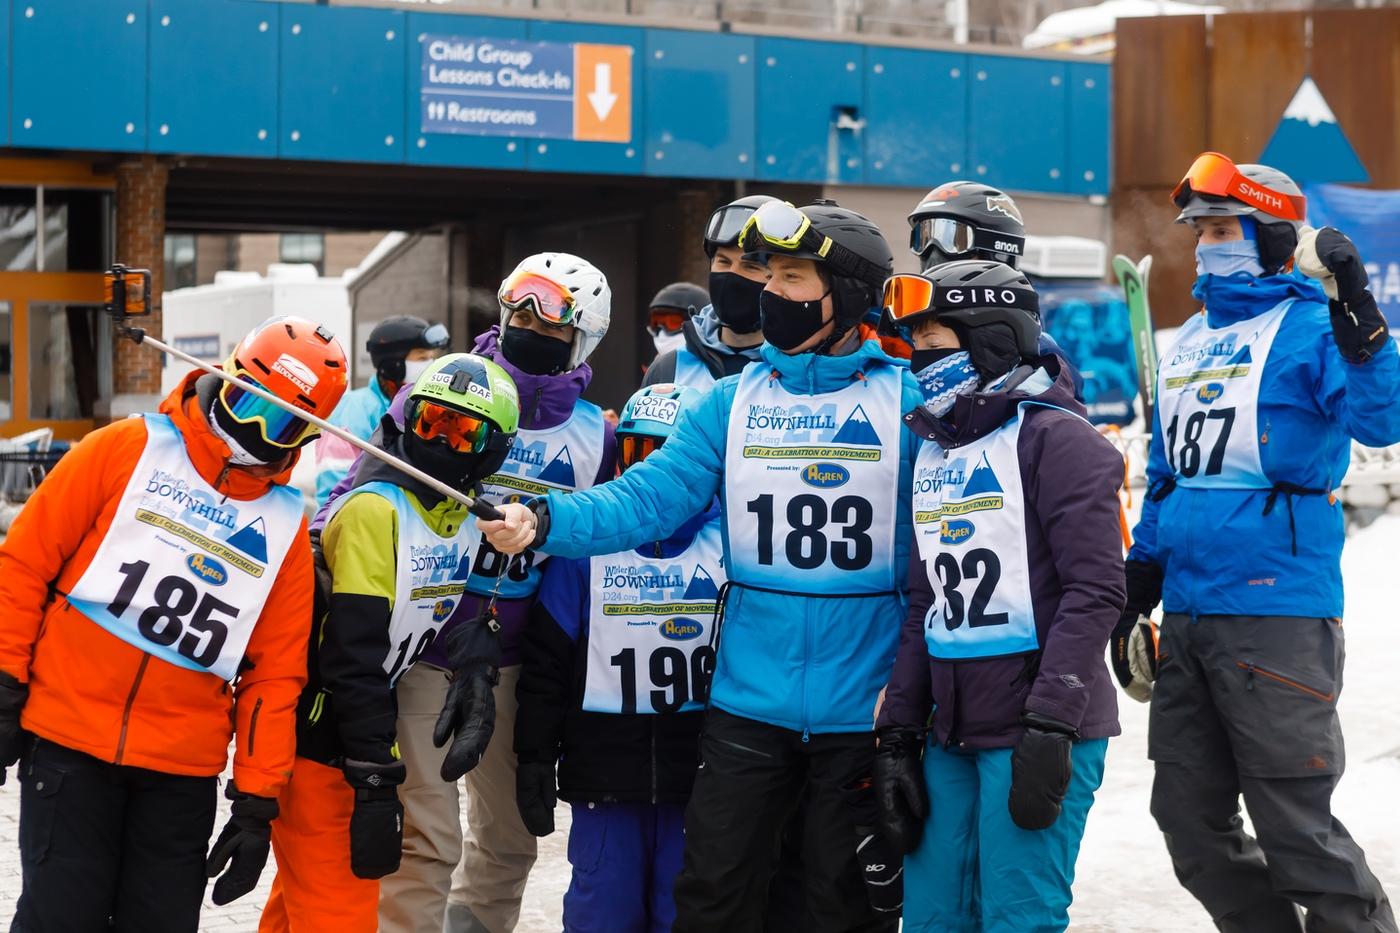 WinterKids Downhill 24 2021 SDP 2854